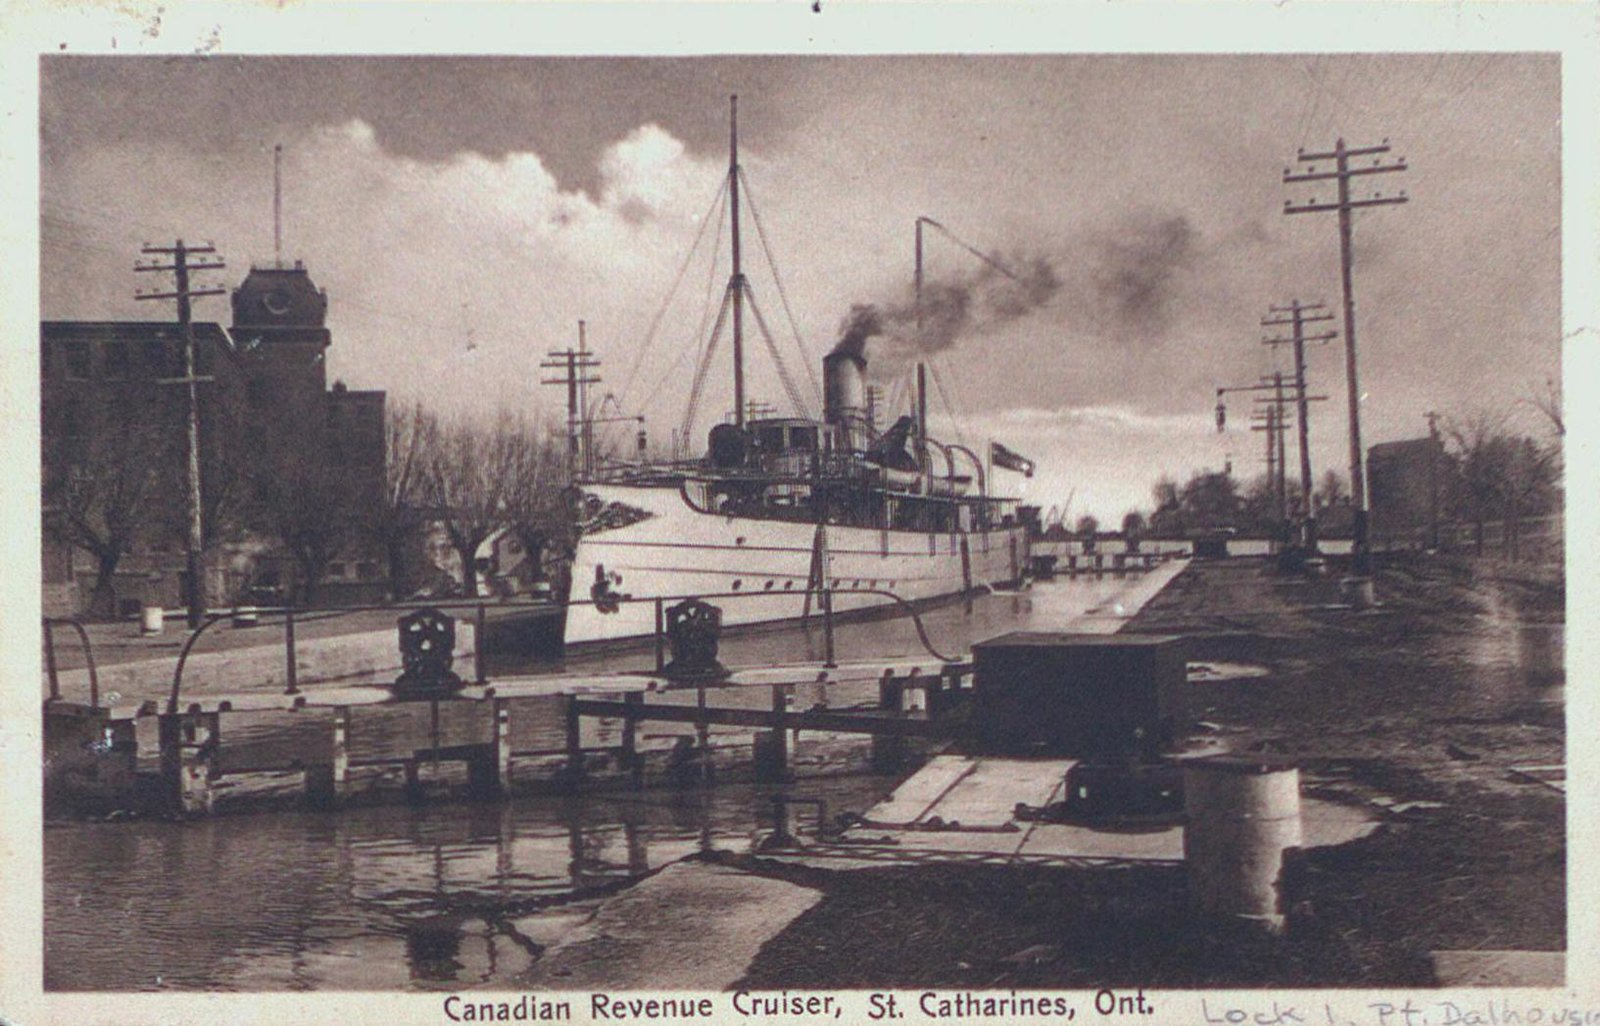 Canadian Revenue Cruiser at Lock 1 of the Third Welland Canal, Port Dalhousie